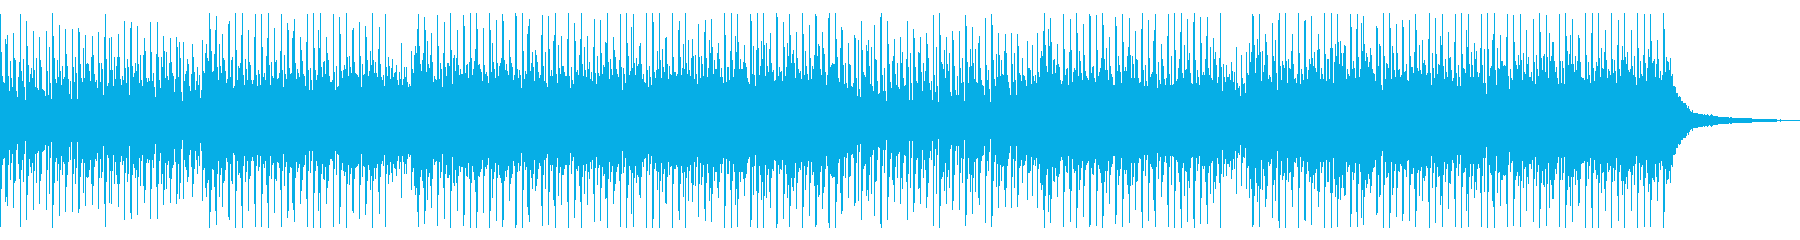 No melody Morning refreshing bright future's reproduced waveform